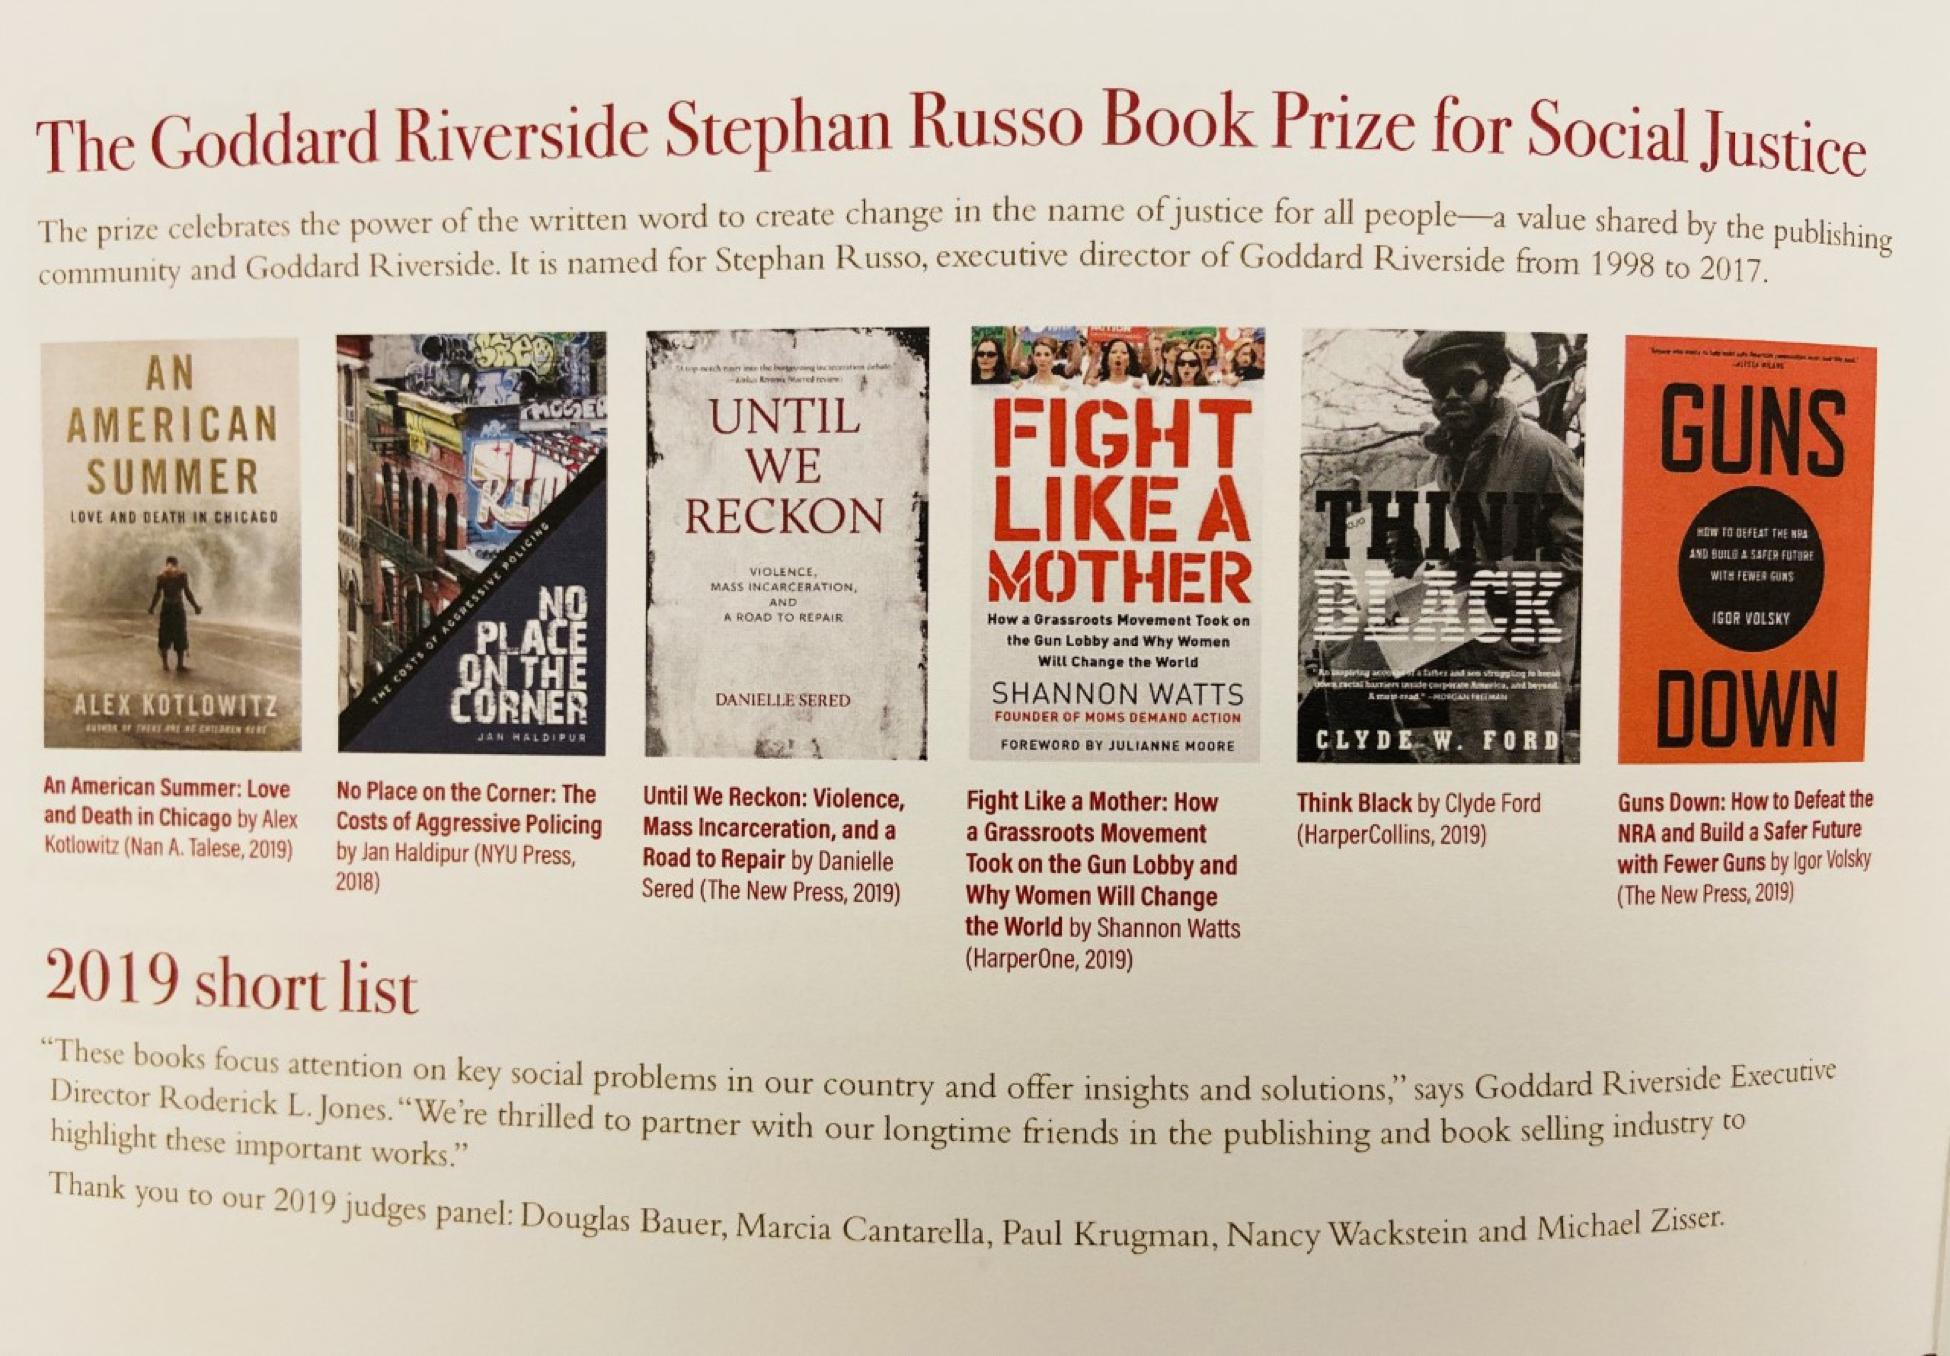 Goddard Riverside Stephan Russo Book Prize finalists